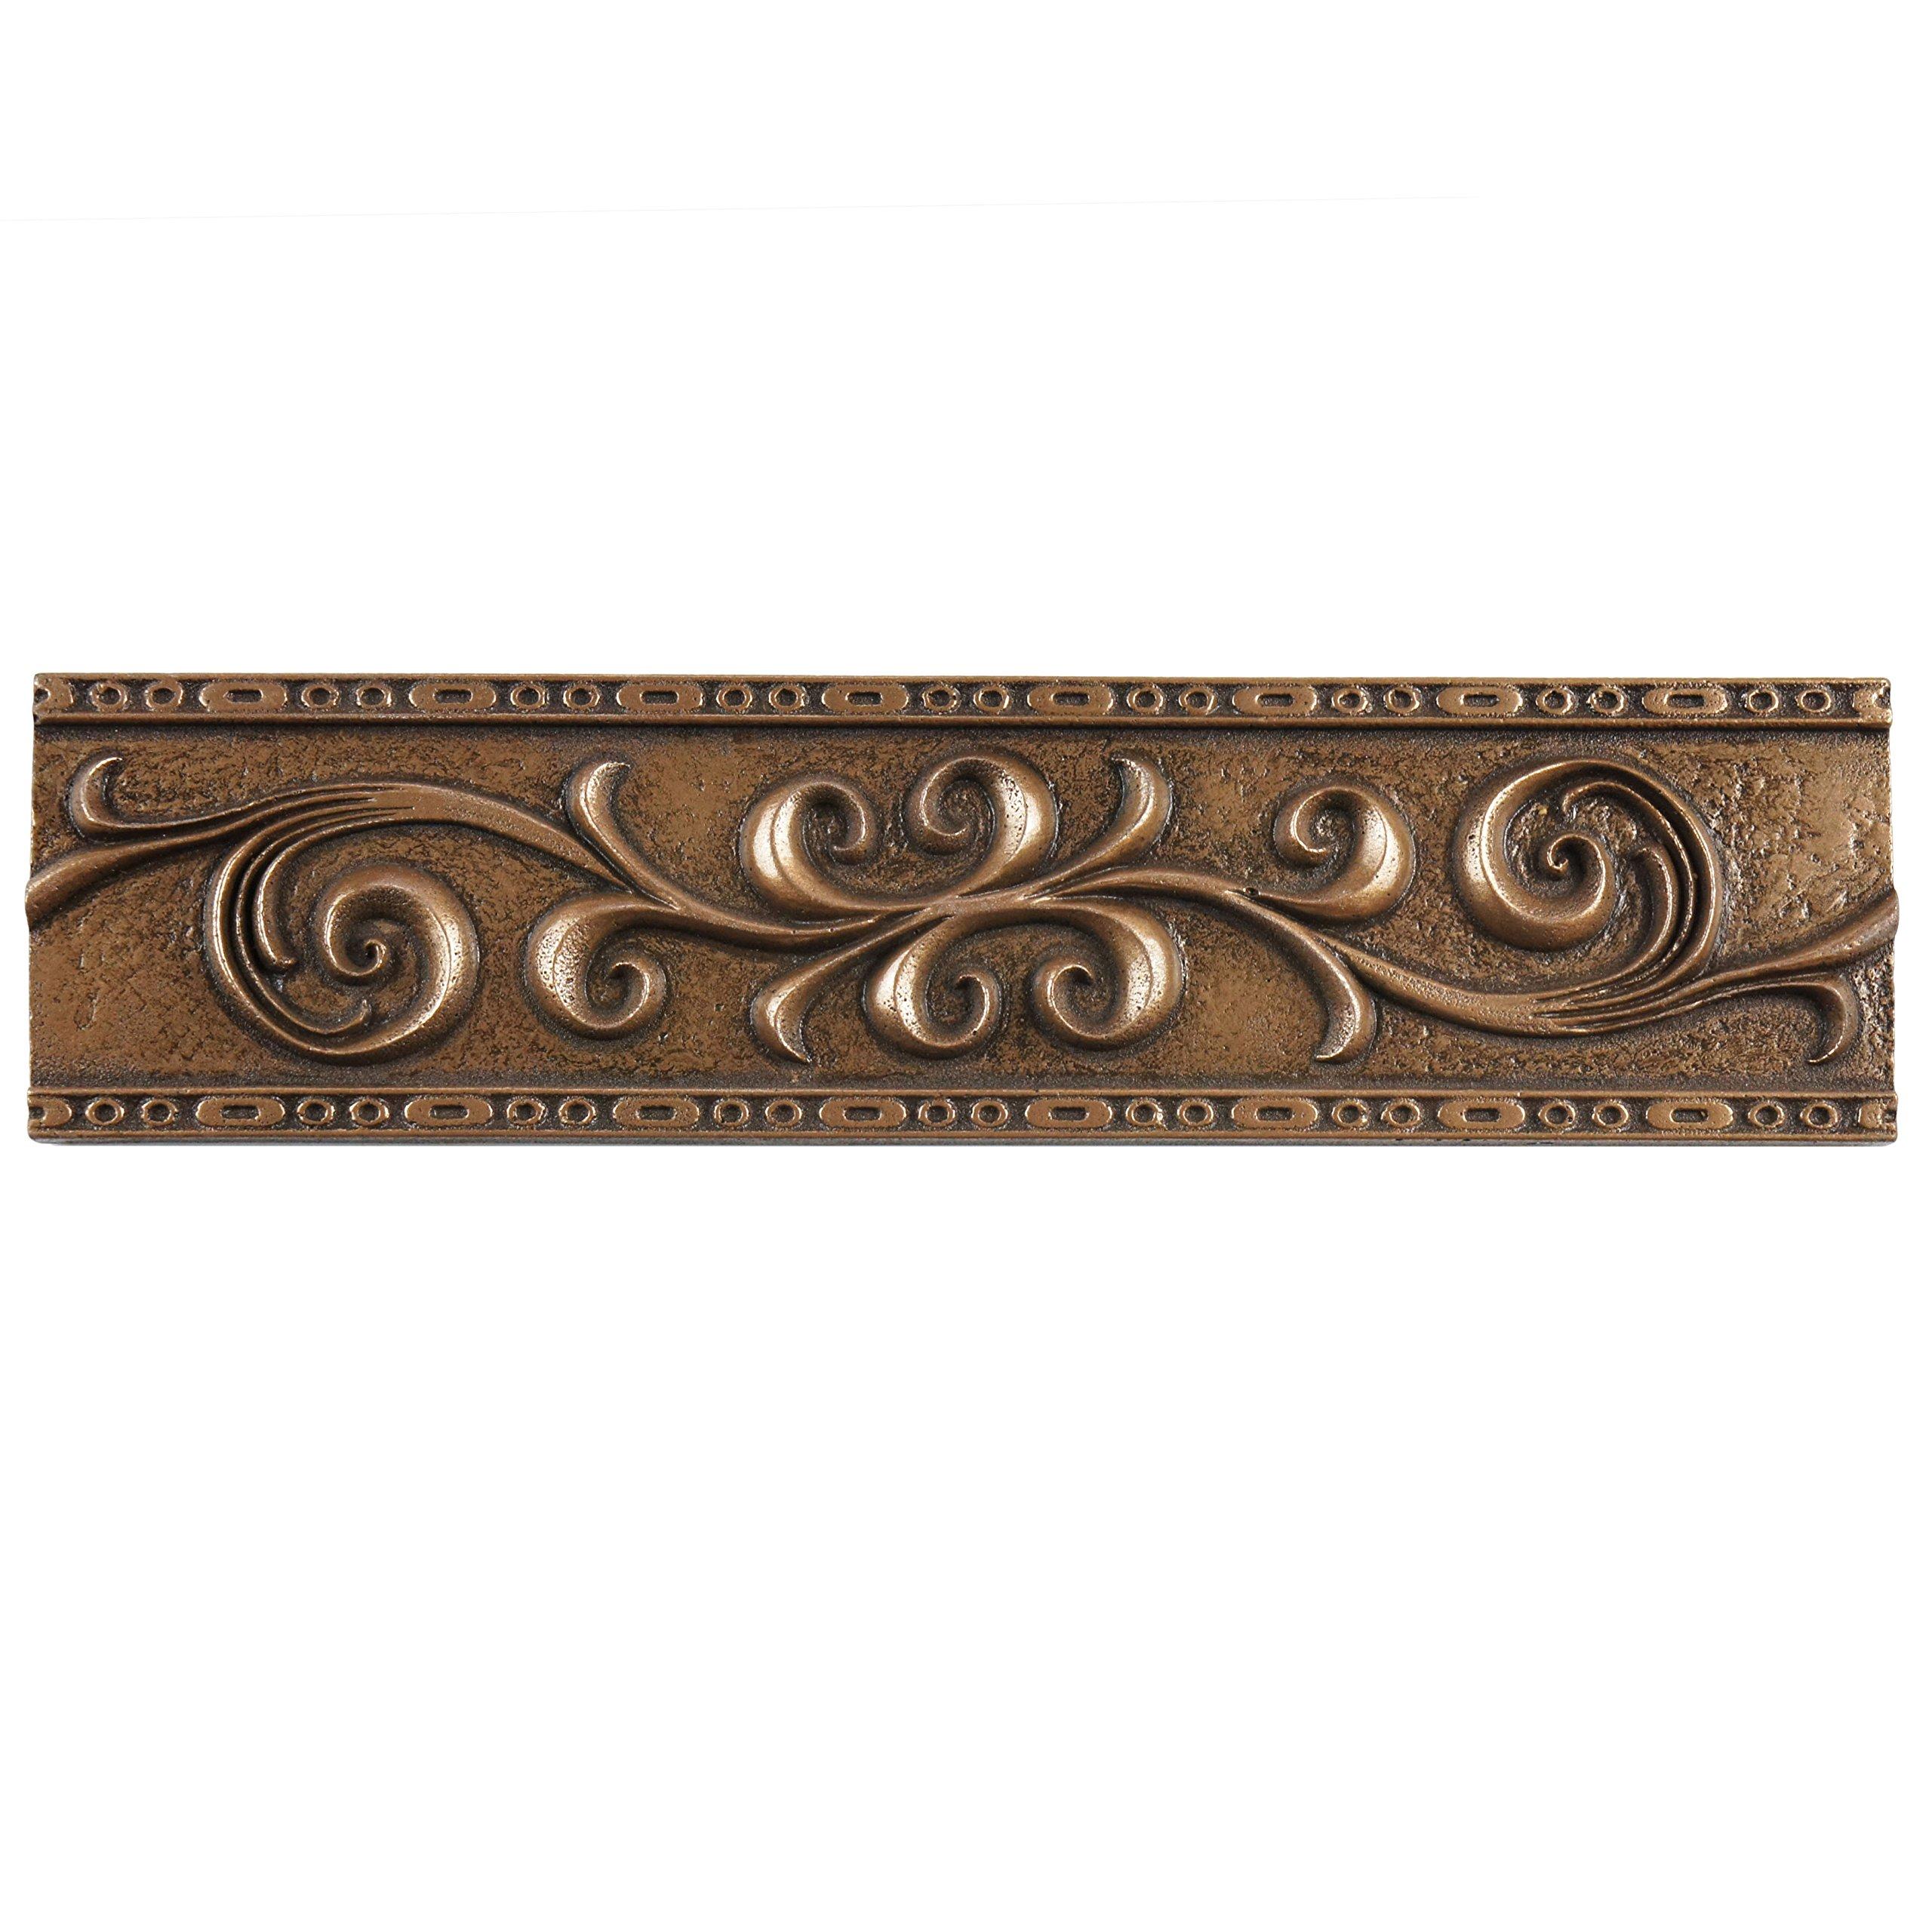 SomerTile WGMSBRRL Denbora Scroll Metallic Liner Wall Trim Tile, 3'' x 12'', Bronze by SOMERTILE